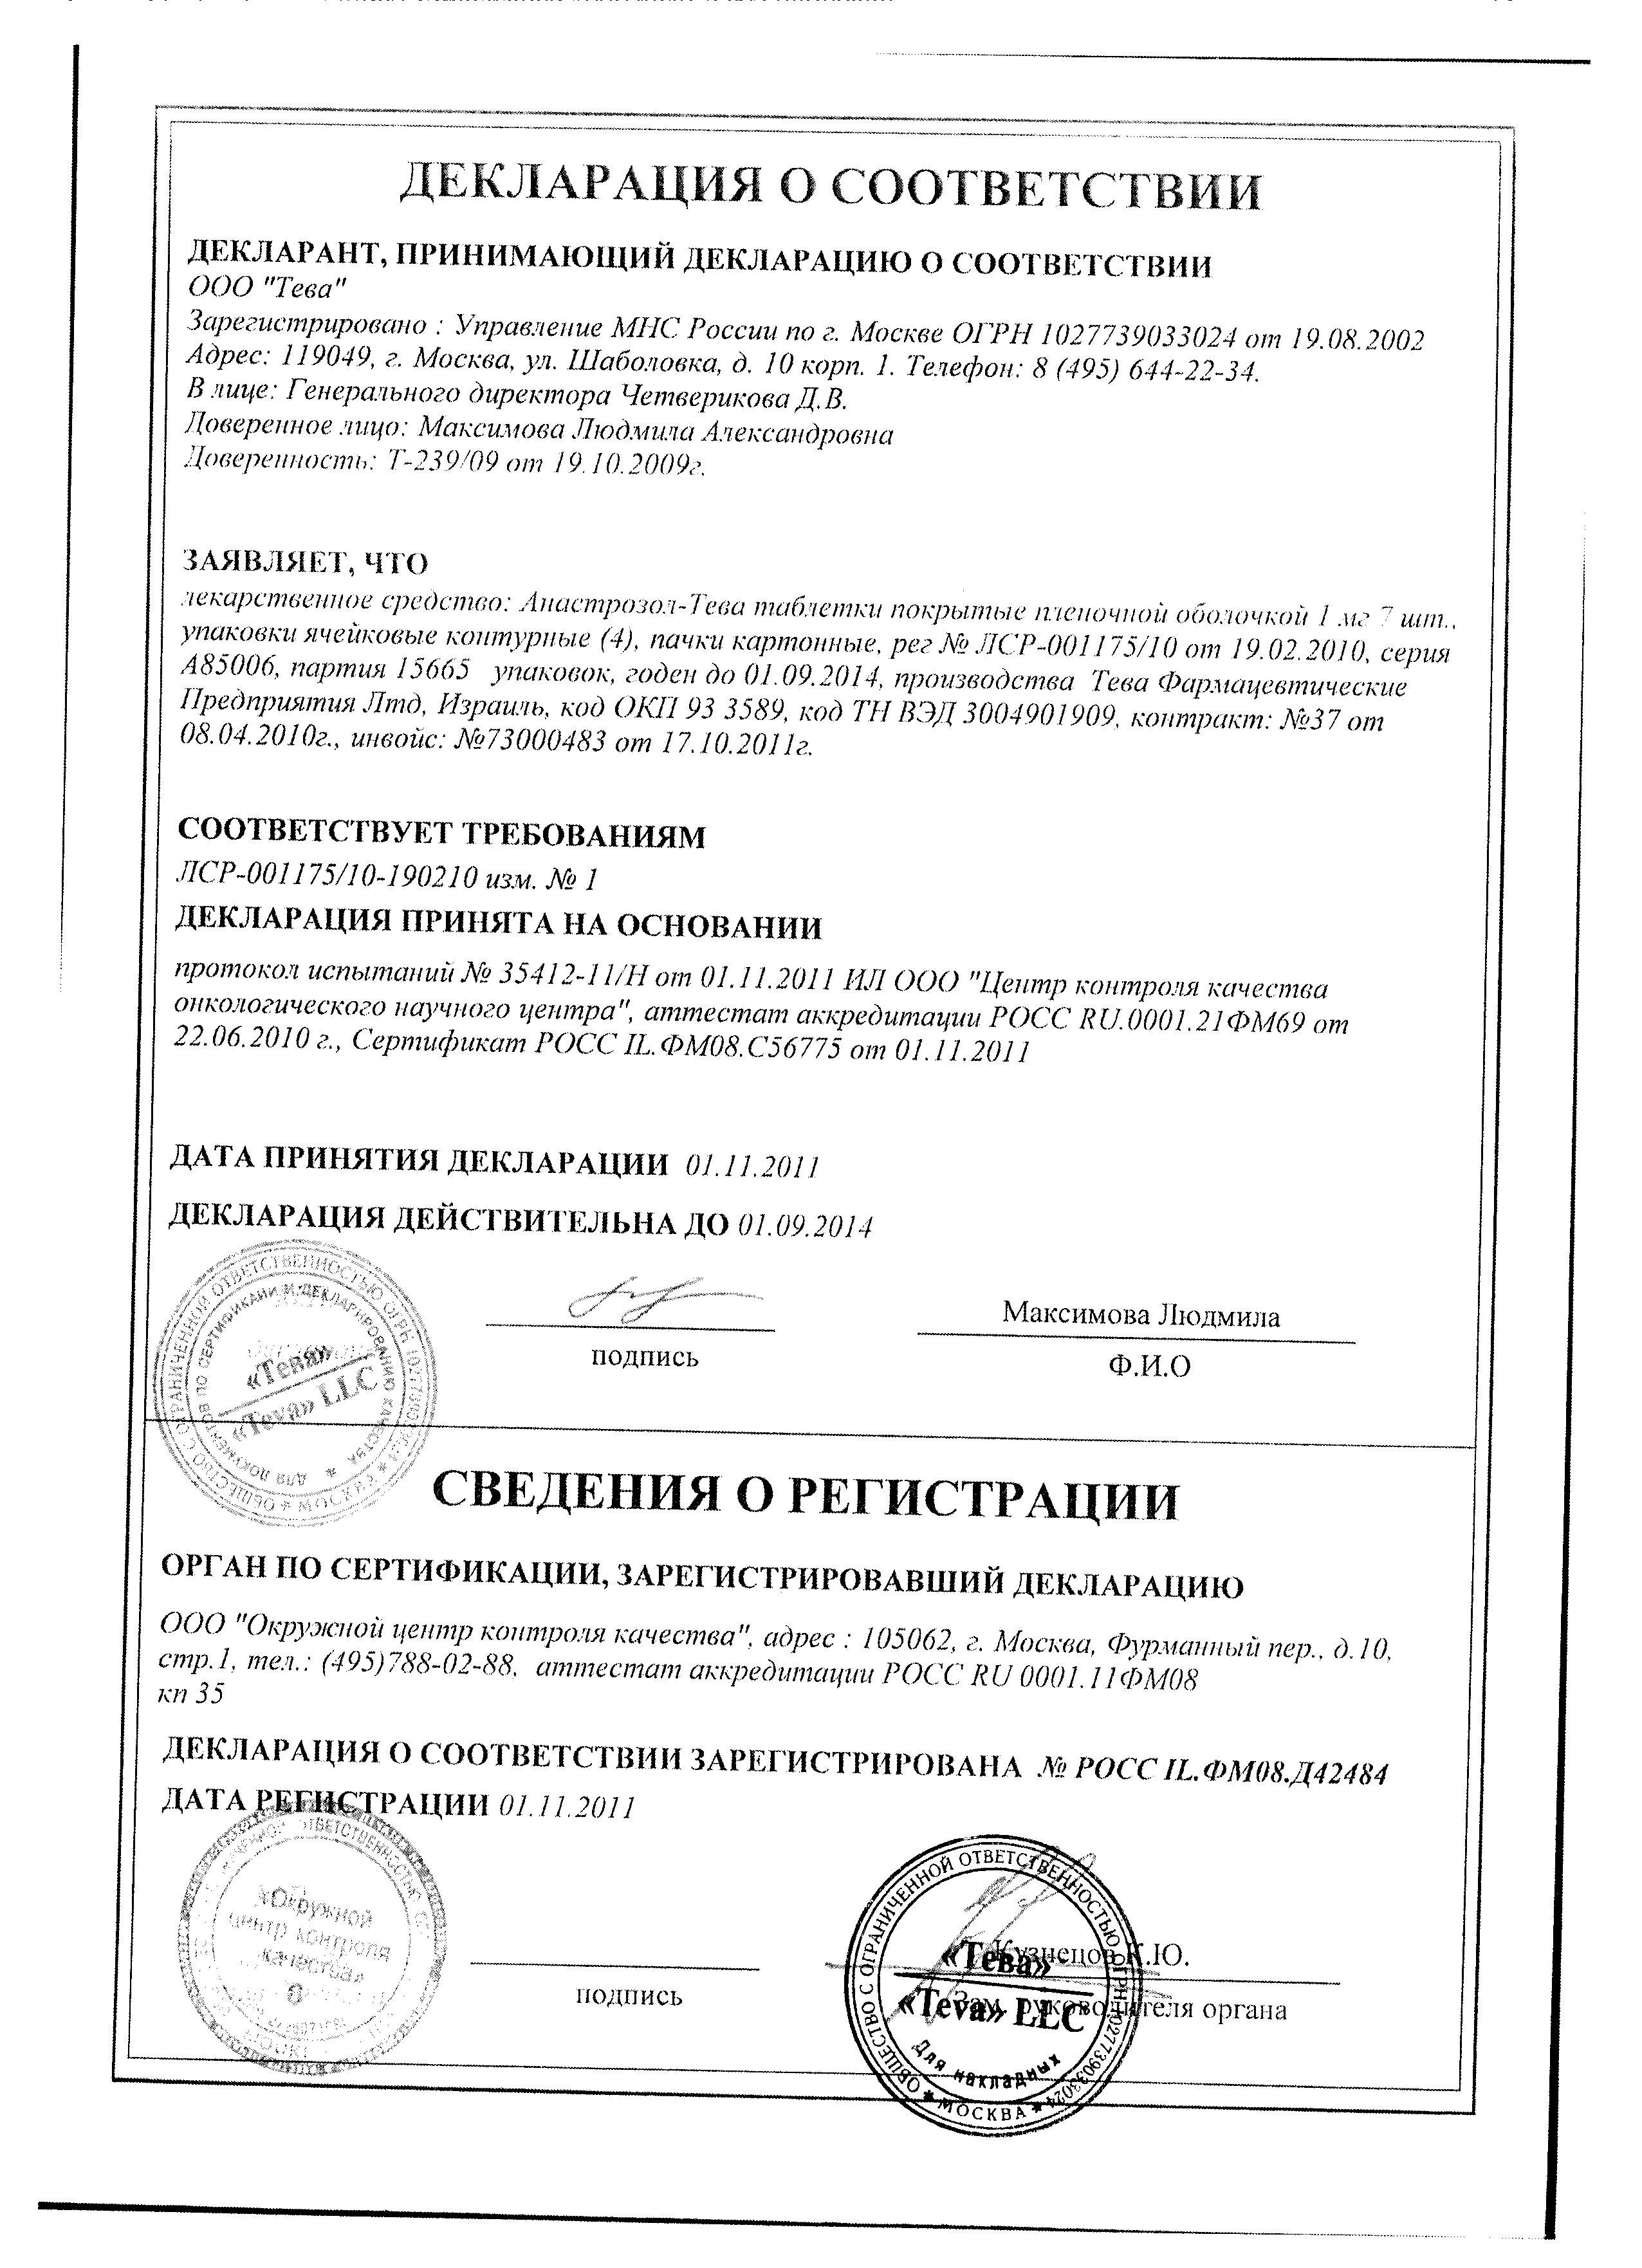 https://avisfarm.com/i/lek/certificates/7771214/36942-00541465.jpg?id=7